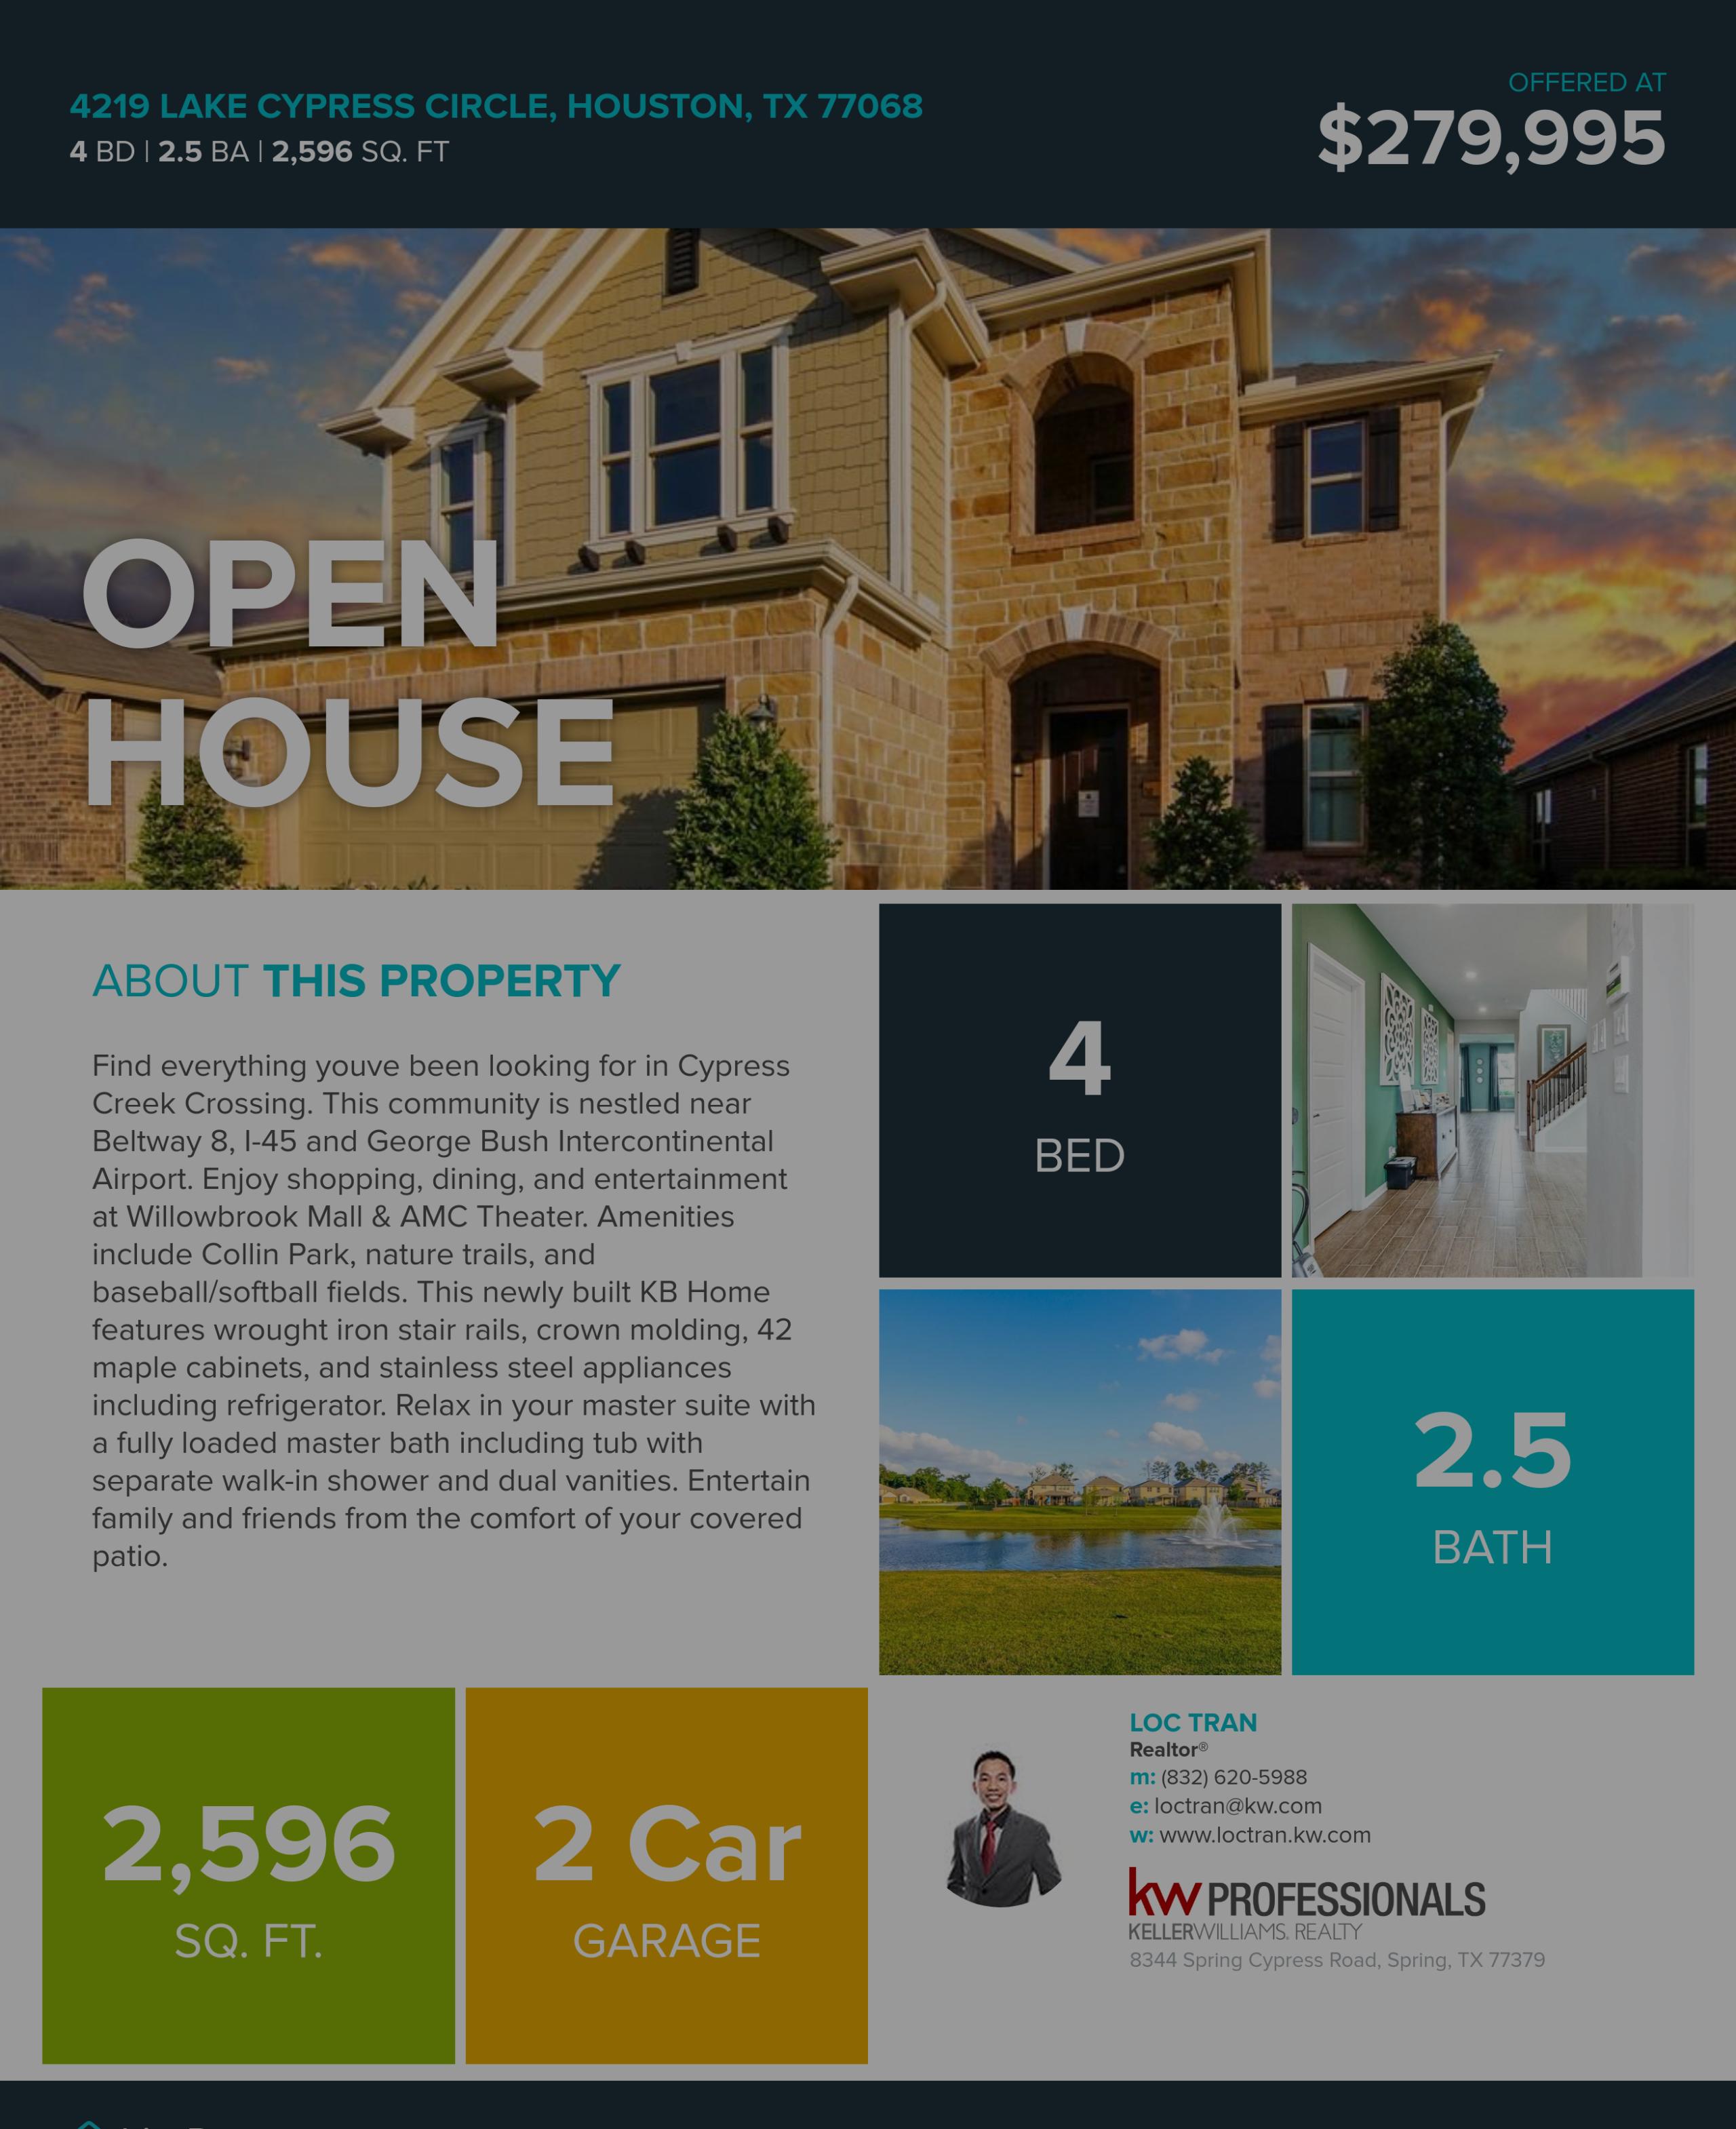 New Built Homes Open House 6/19 & 6/23